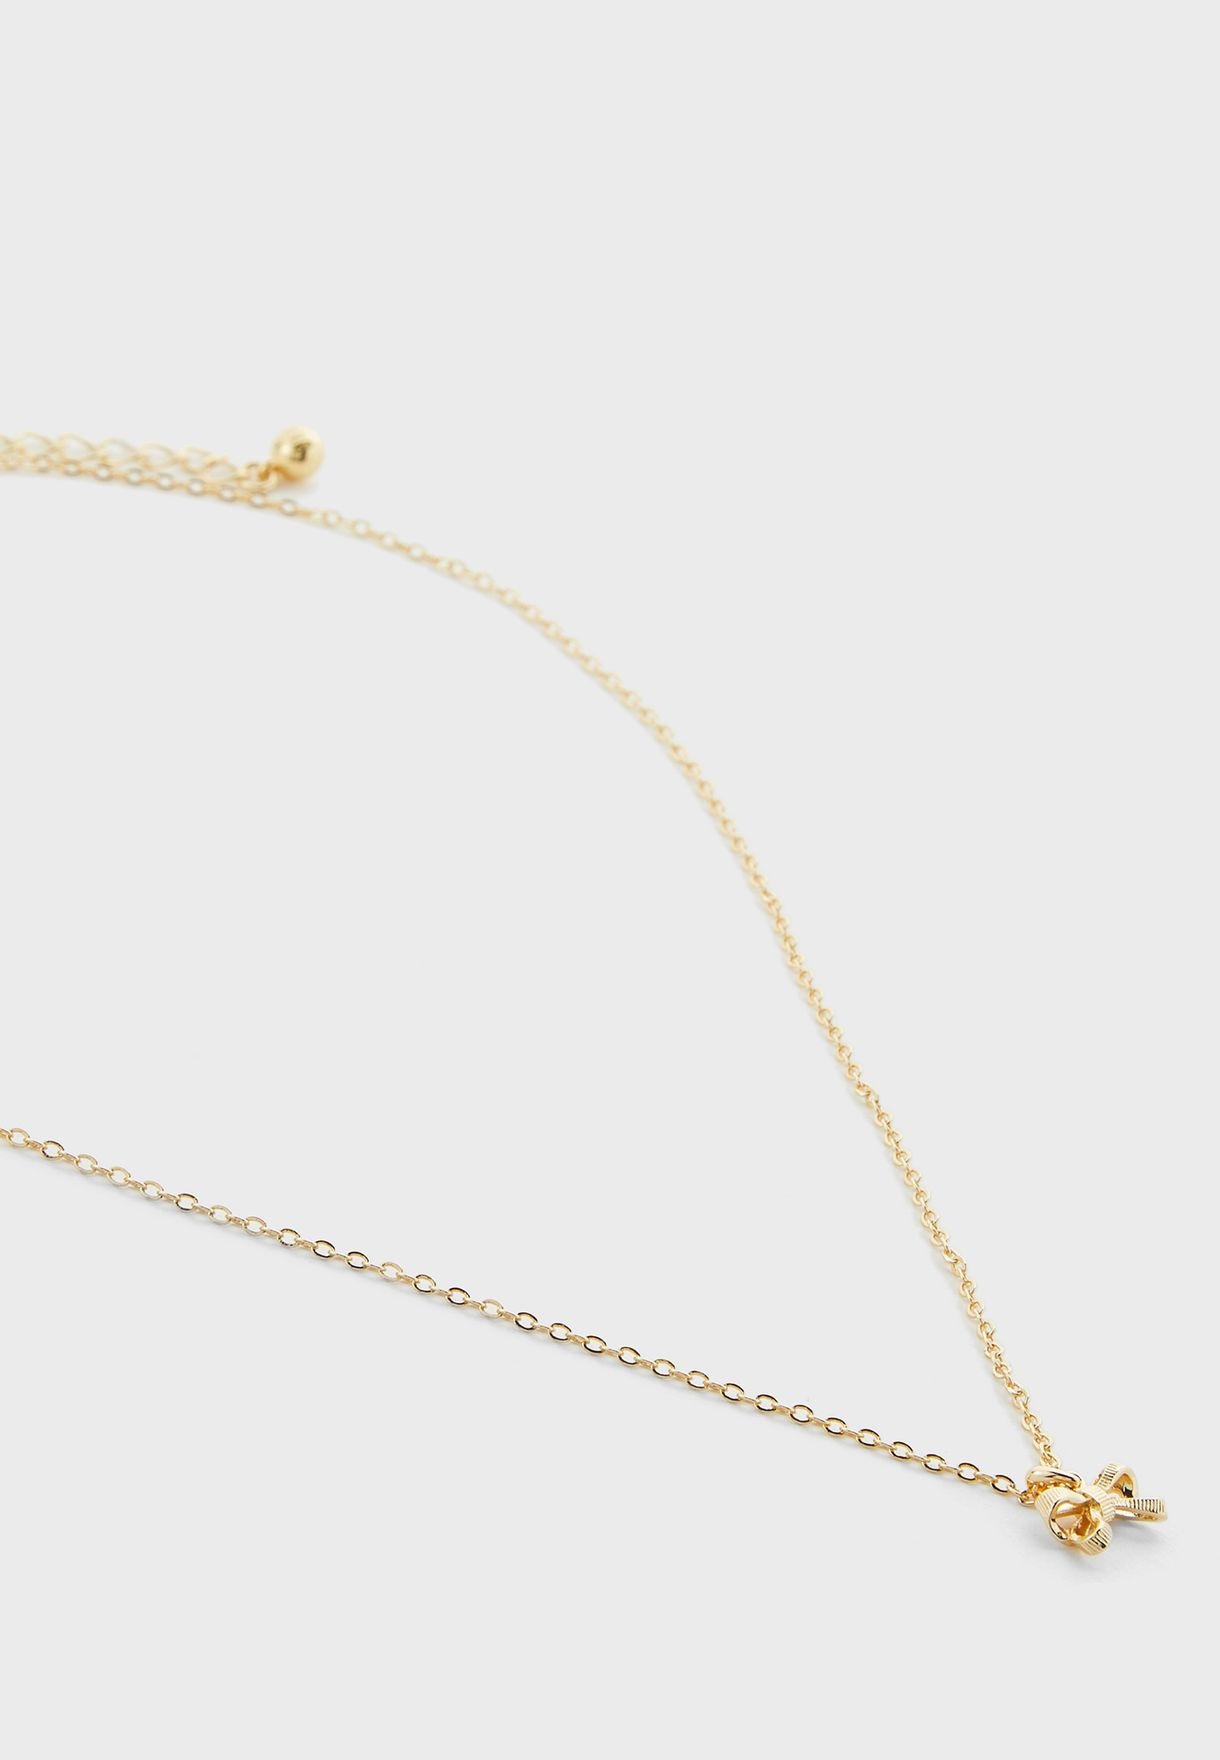 Petrae Petite Bow Pendant Necklace